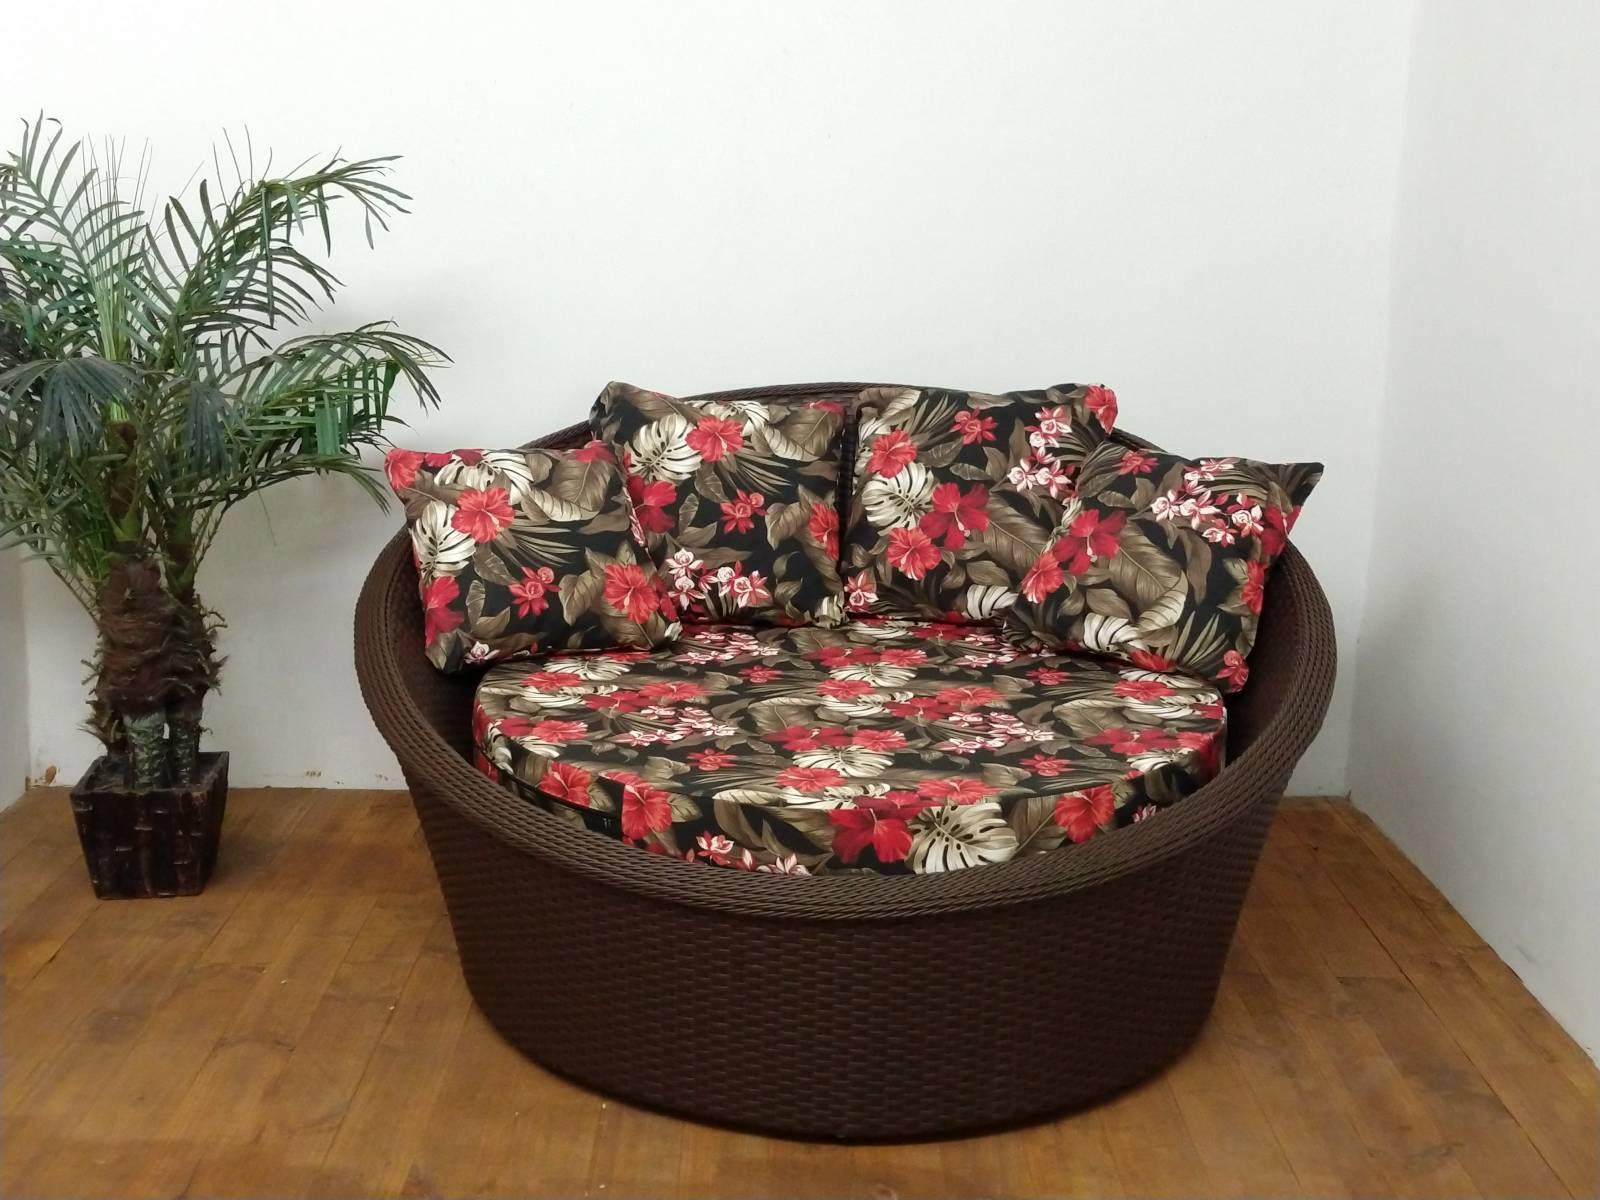 Chaise Redondo 1.50M - Cor Tabaco & Mauí preto - Deck & Decor